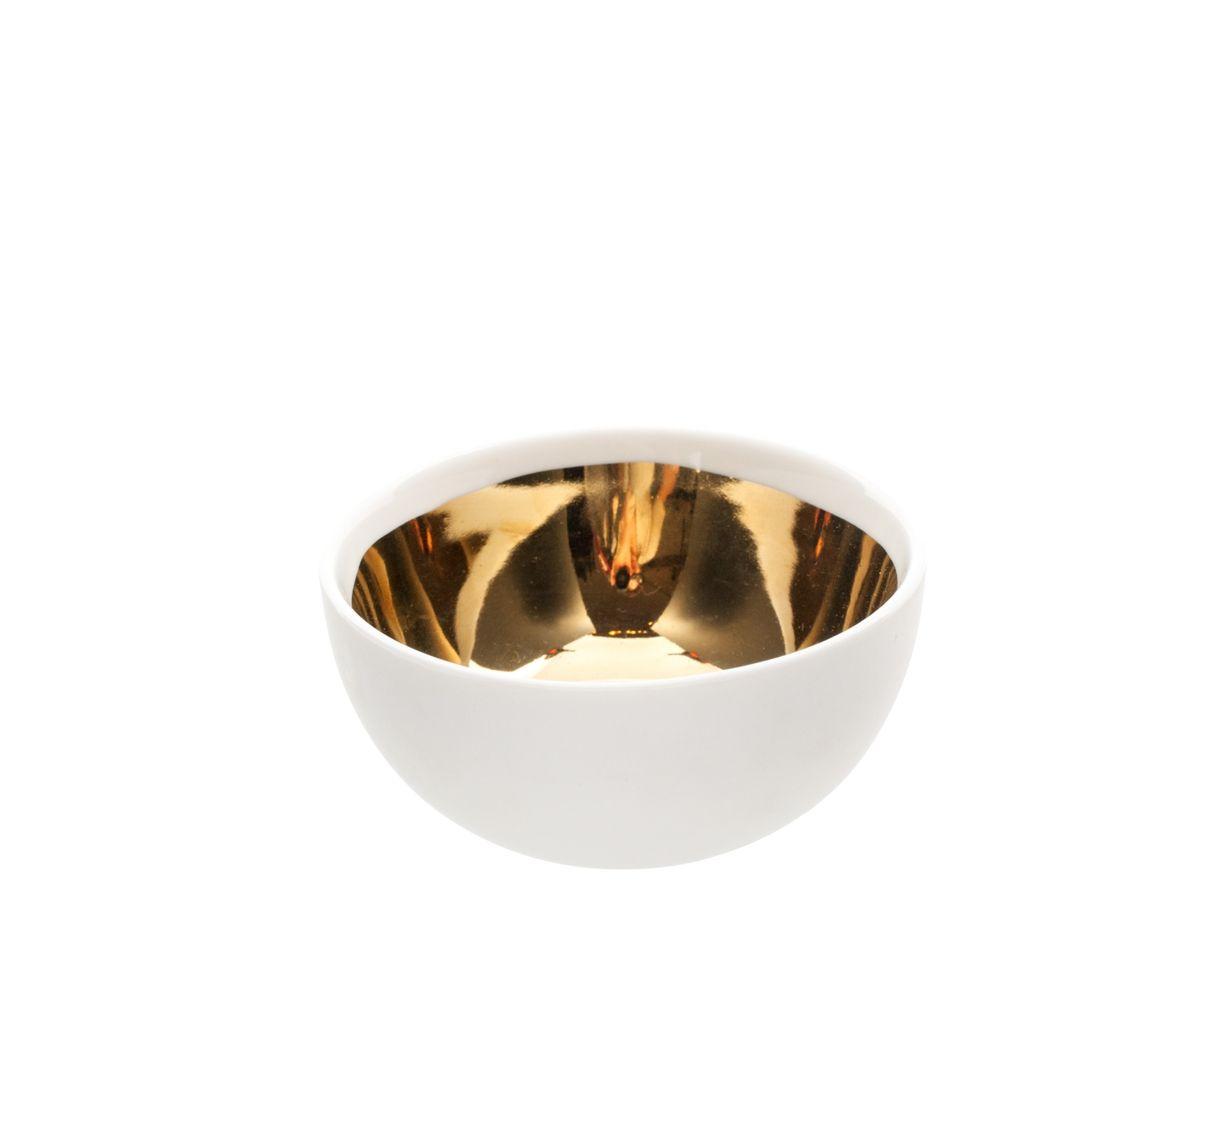 Large Dauville Bowl | Handmade porcelain bowl with glazed gold interior.